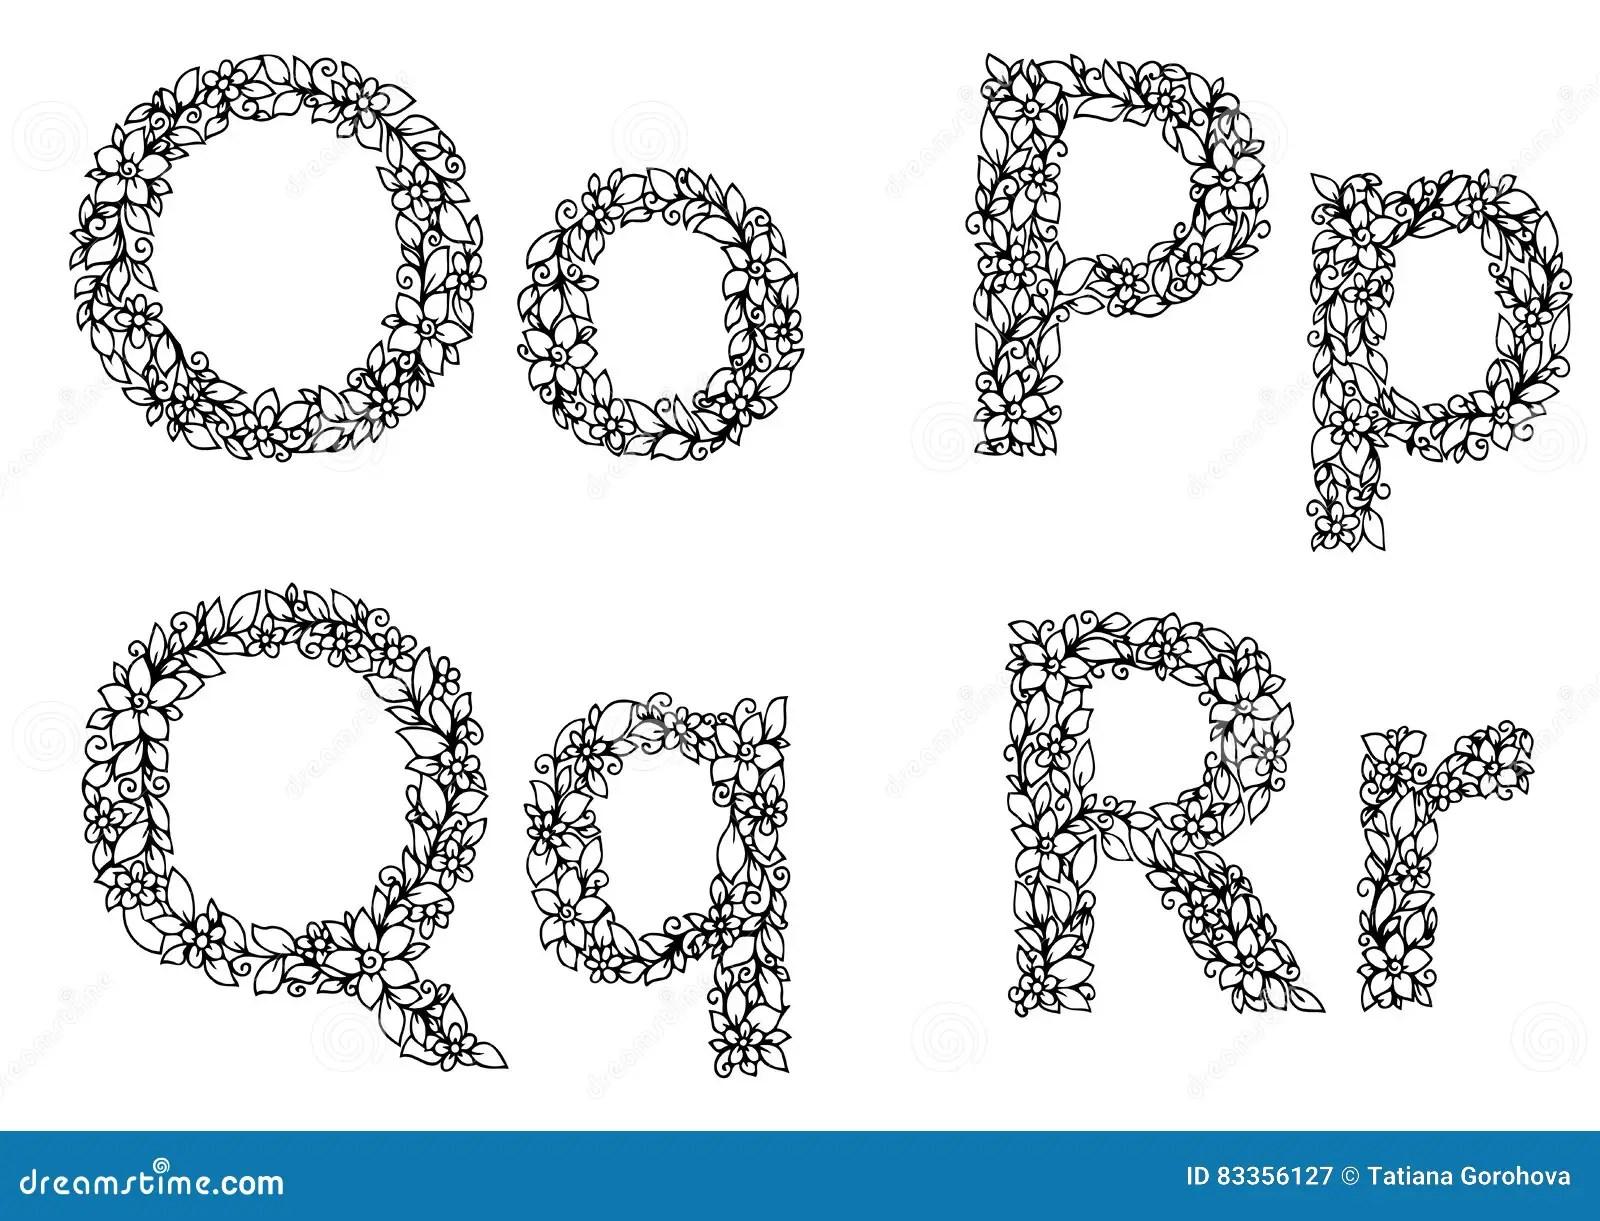 Vector Illustration Zentangl, Flower Letters O, P, Q, R